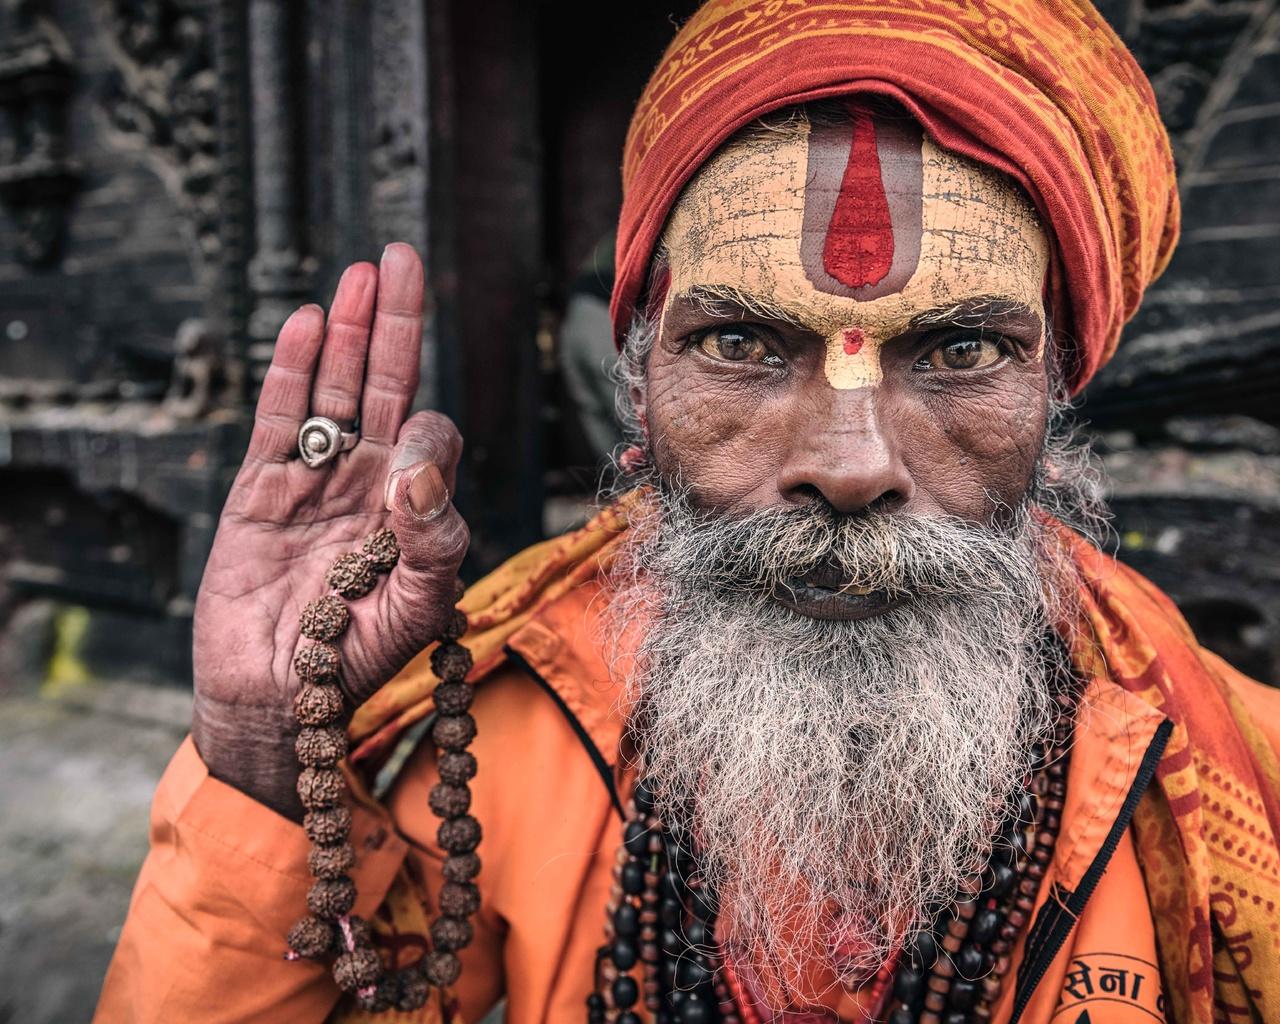 nepal, kathmandu, portrait of a sadhu, старик, руки, борода, лицо, текстуры